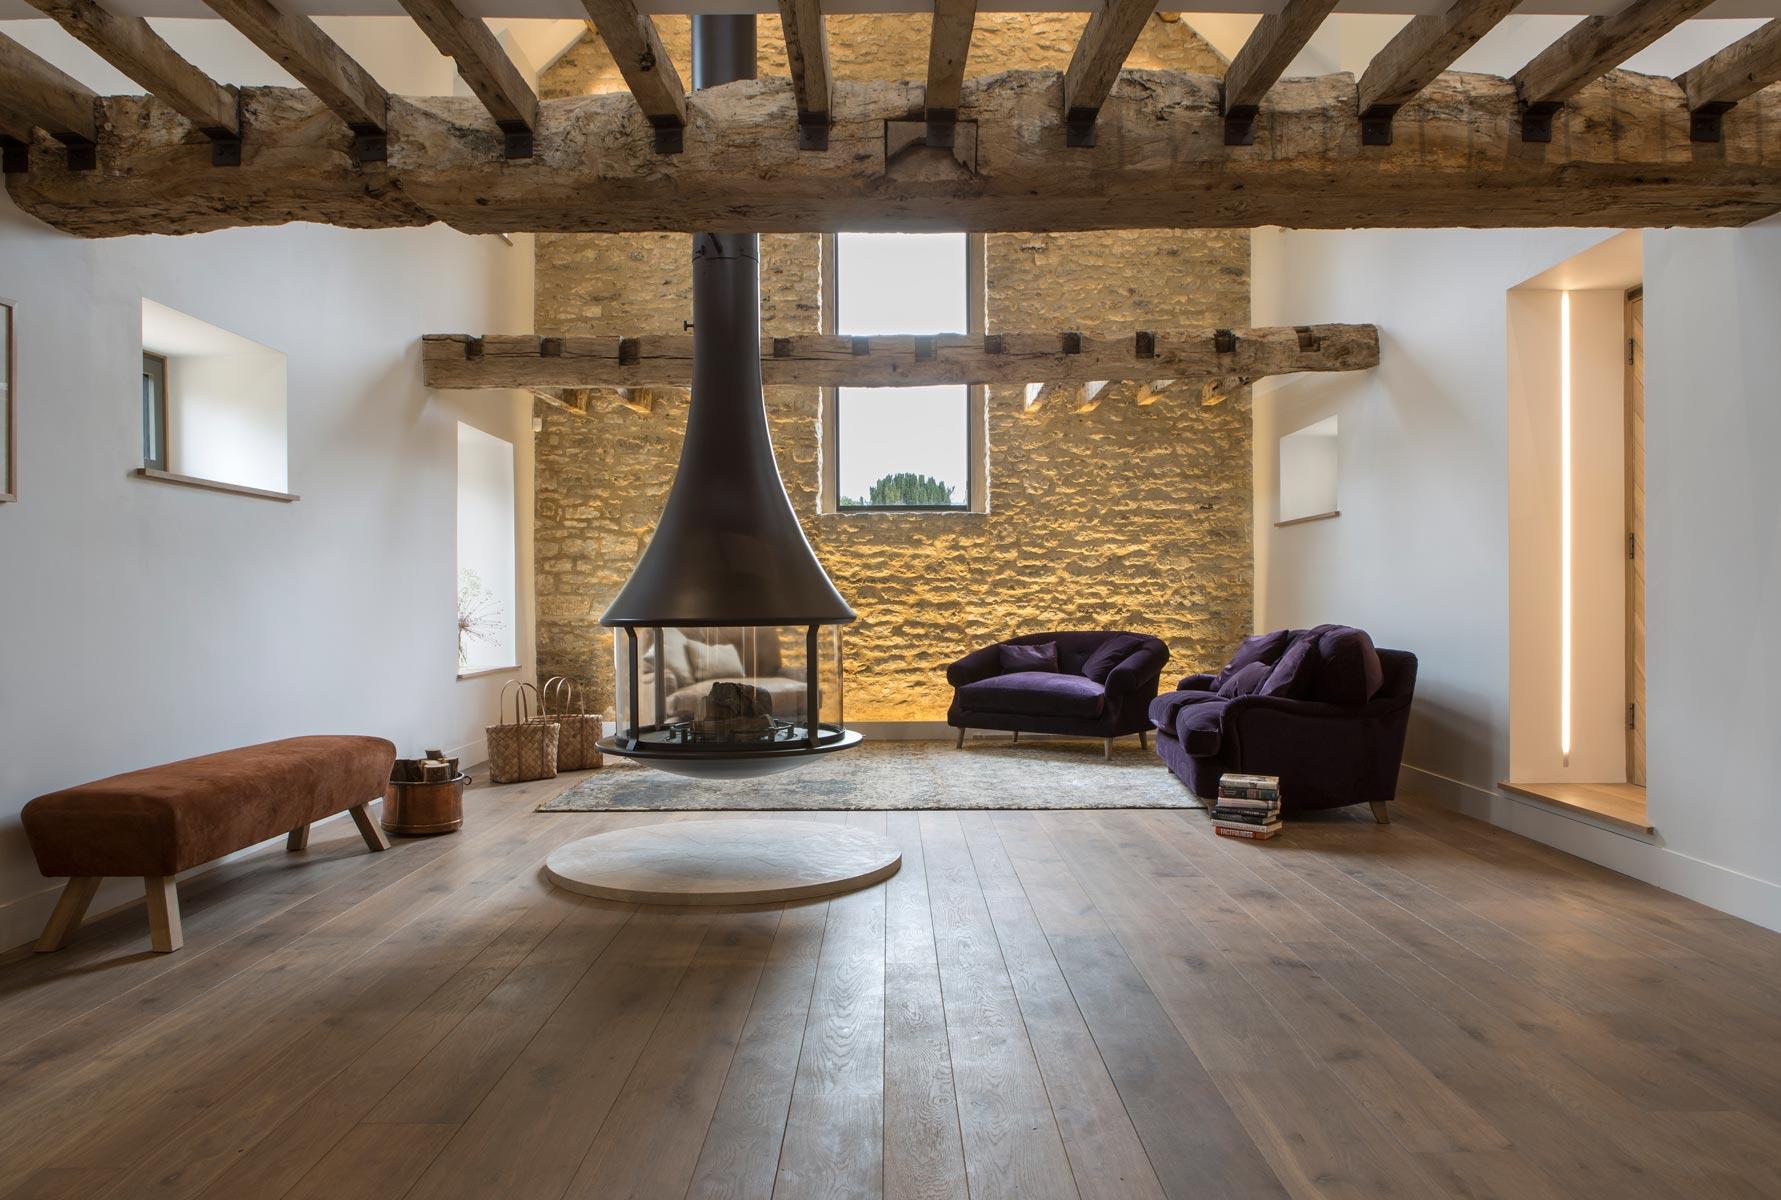 barn-conversion-5-random-width-flooring-oxfordshire-rogue-designs-1.jpg